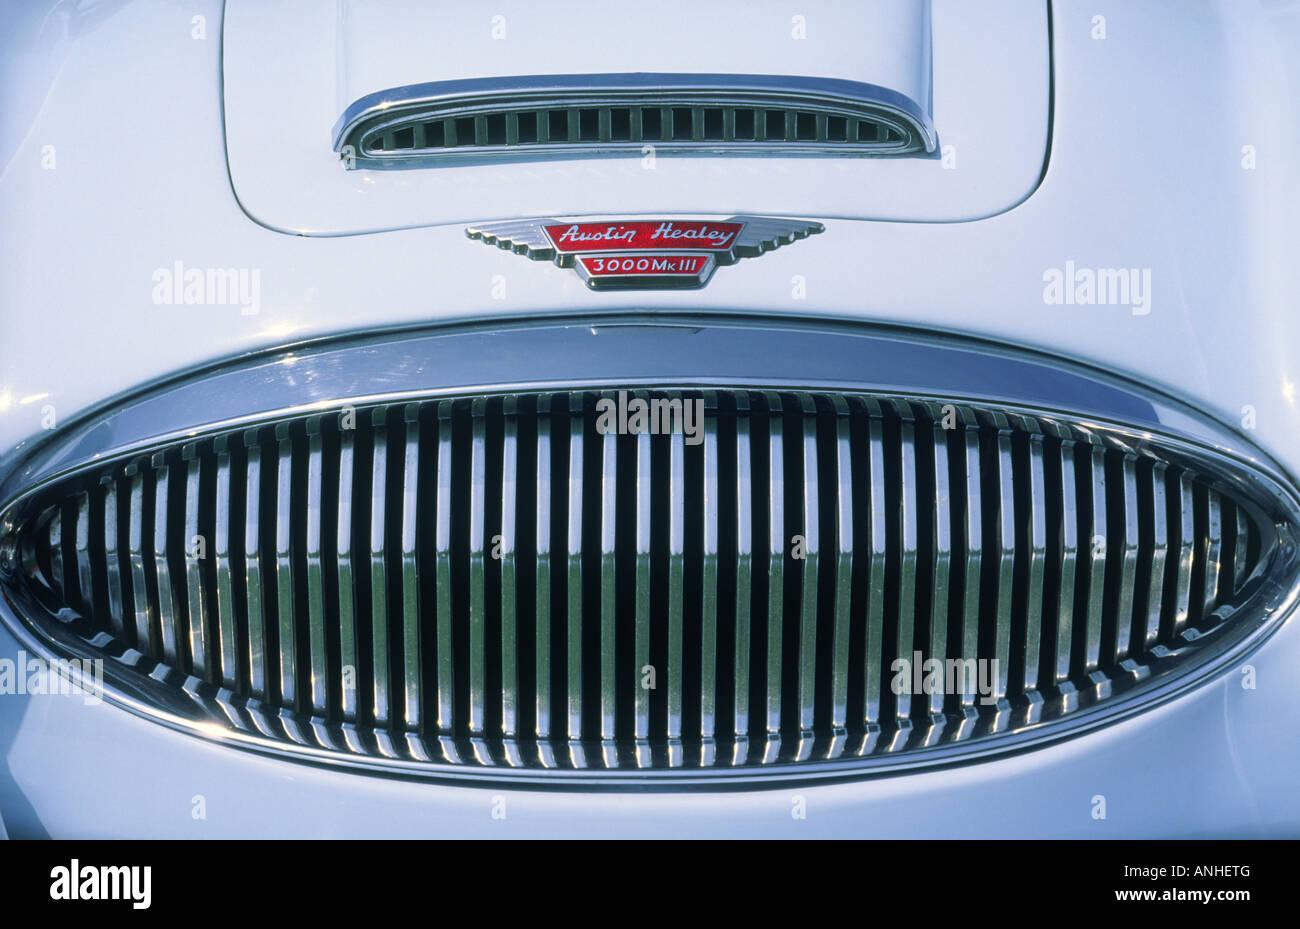 Austin Healey 3000 Motorhaube und Chrom Grill Stockbild